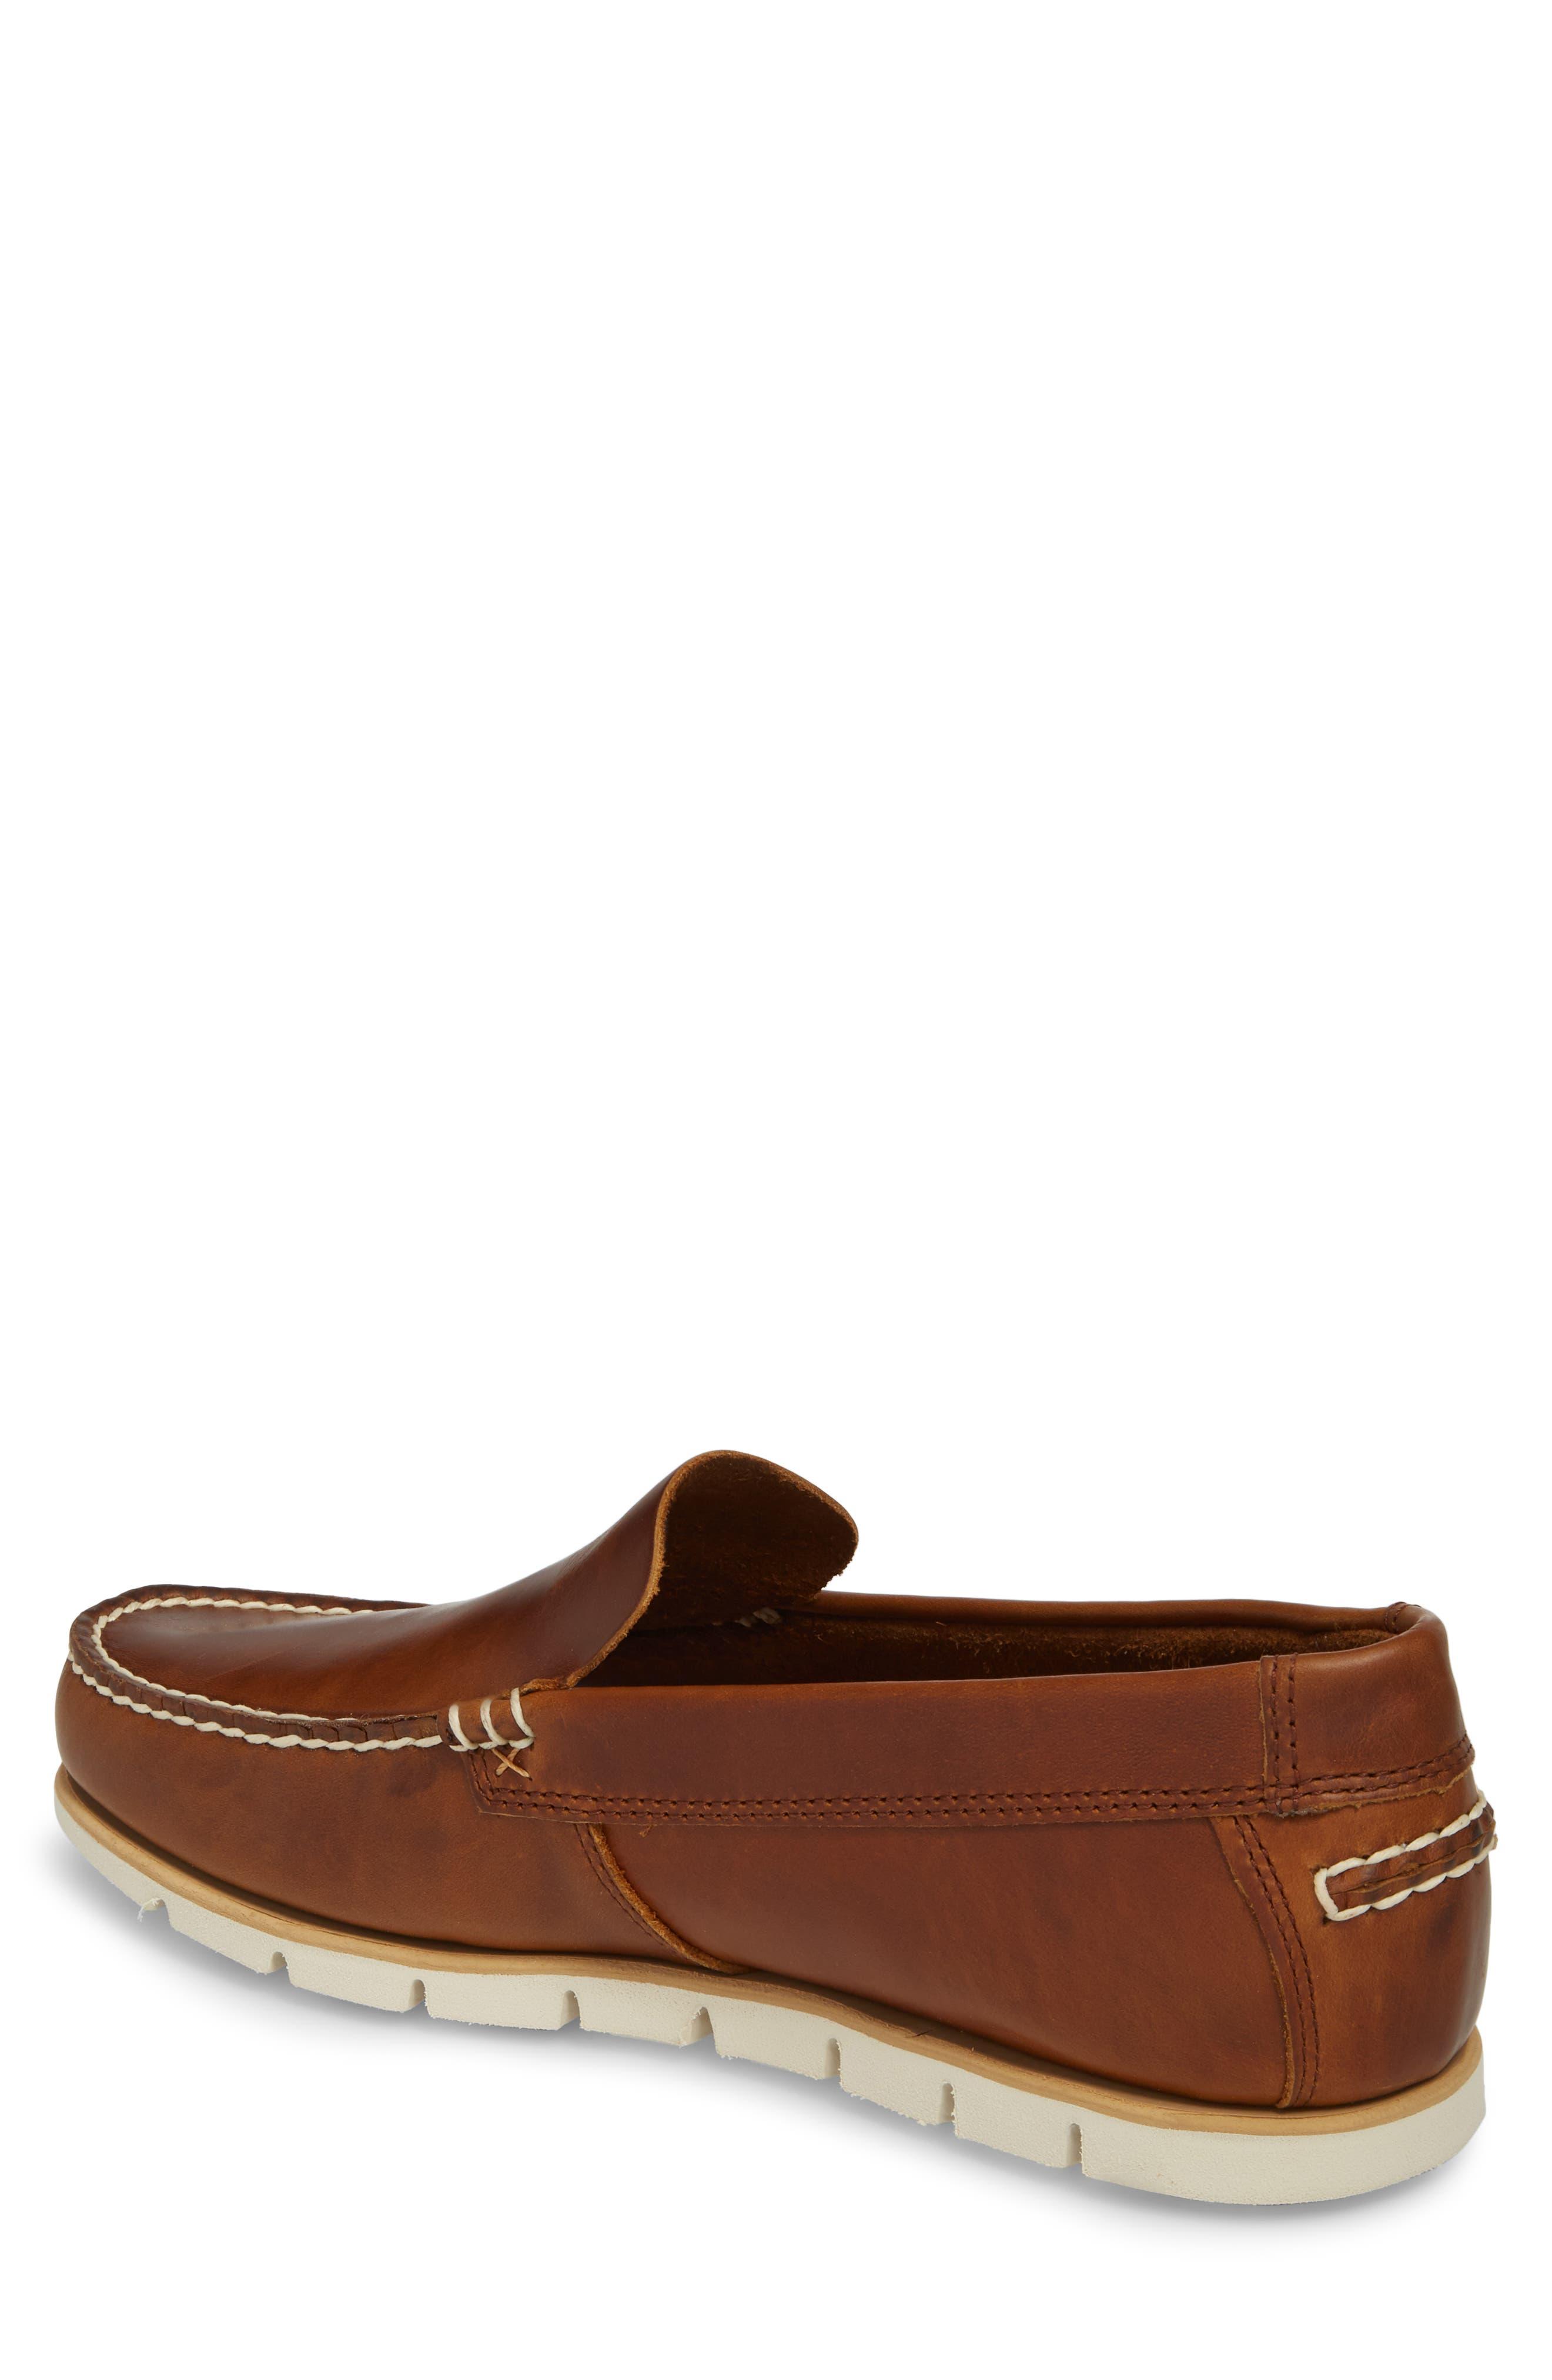 Tidelands Venetian Loafer,                             Alternate thumbnail 2, color,                             Brown